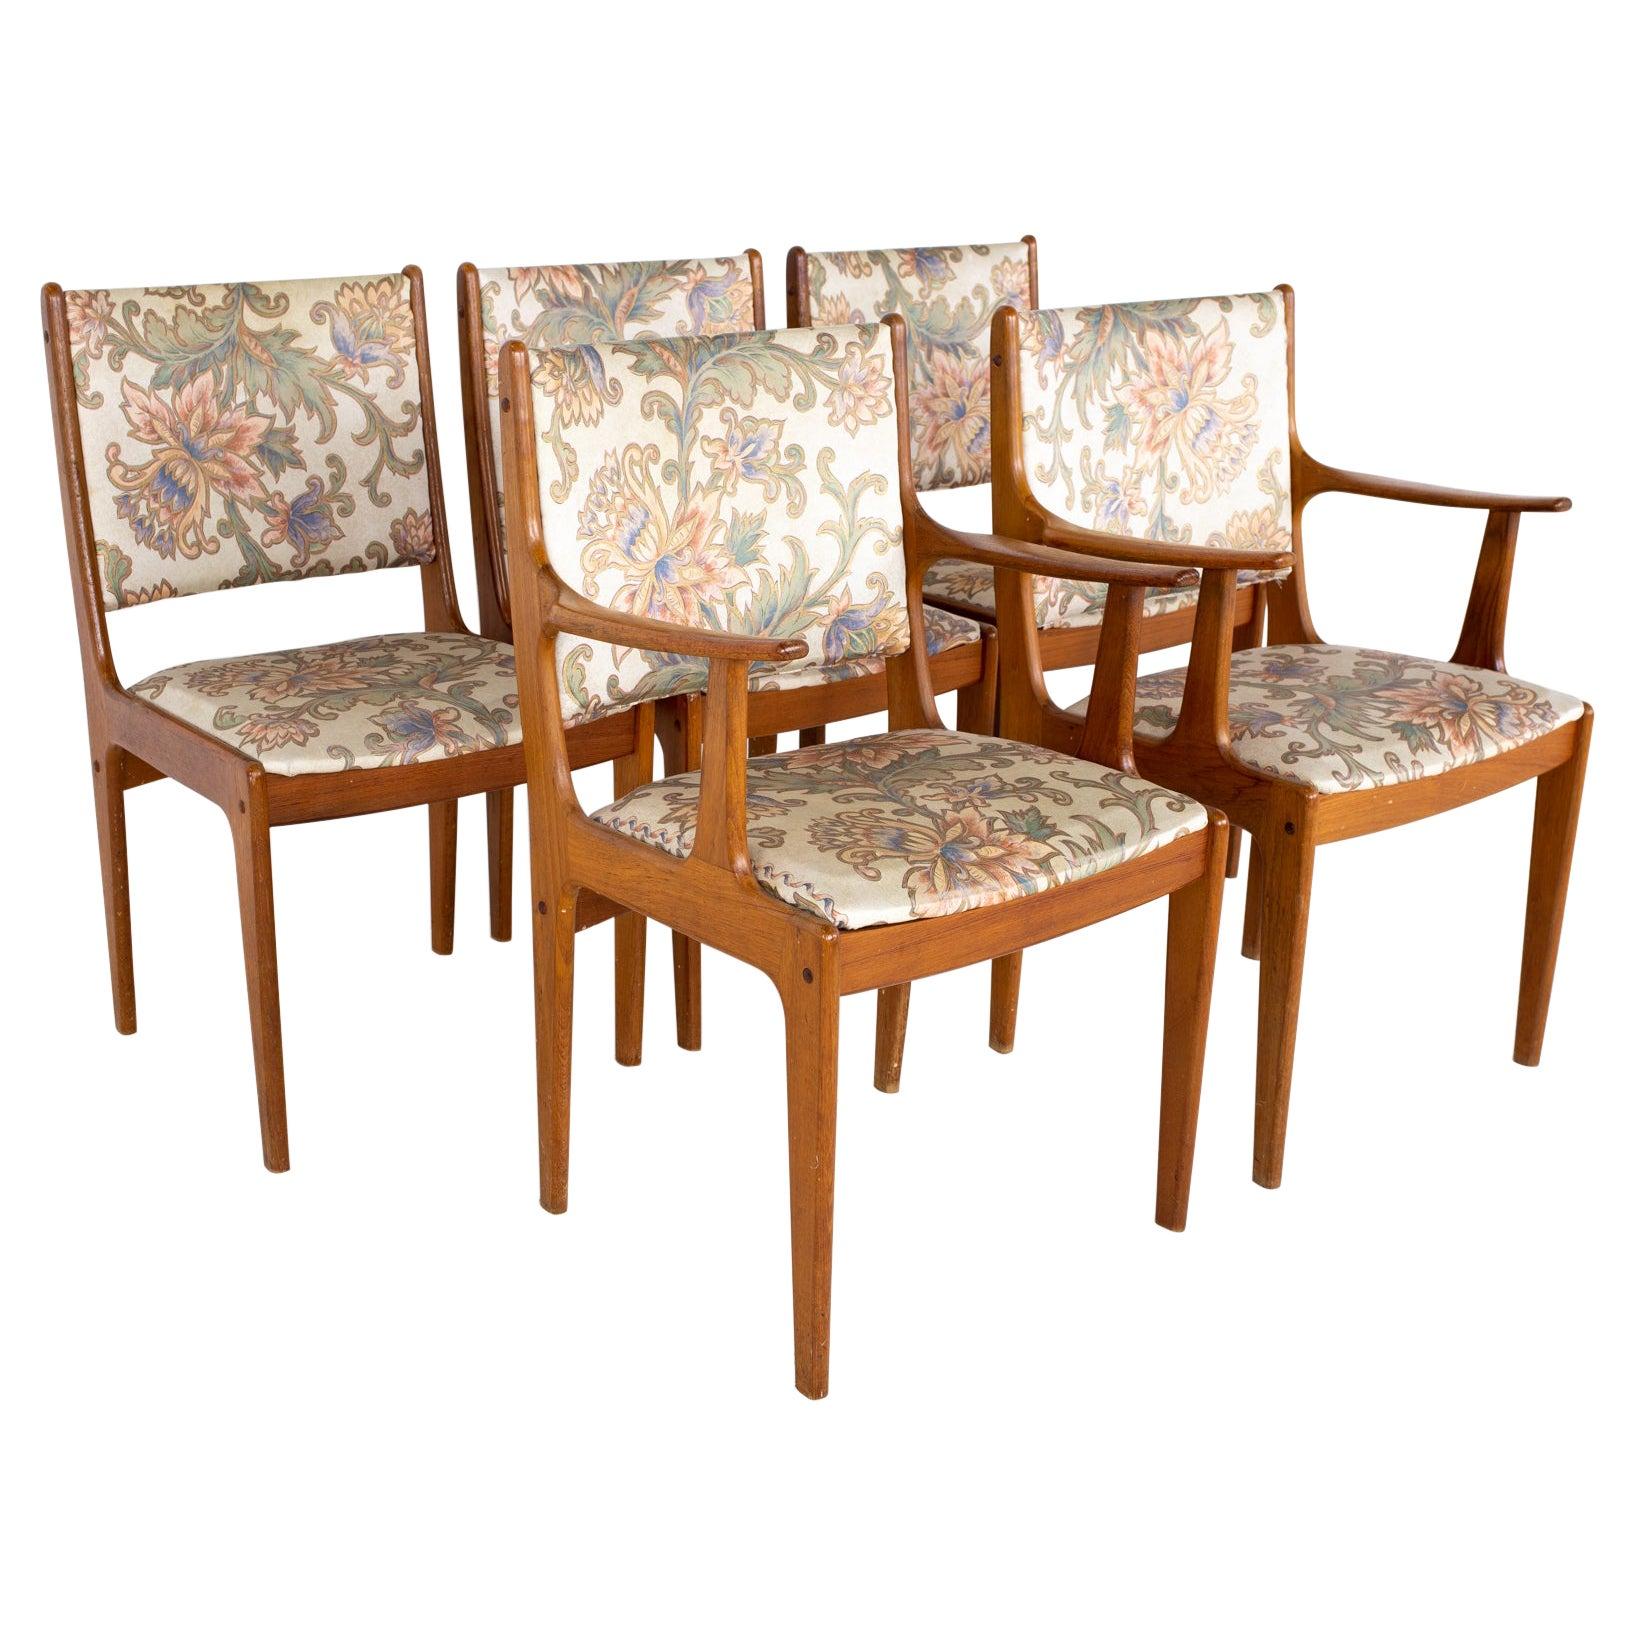 Mid Century Teak Dining Chairs, Set of 5